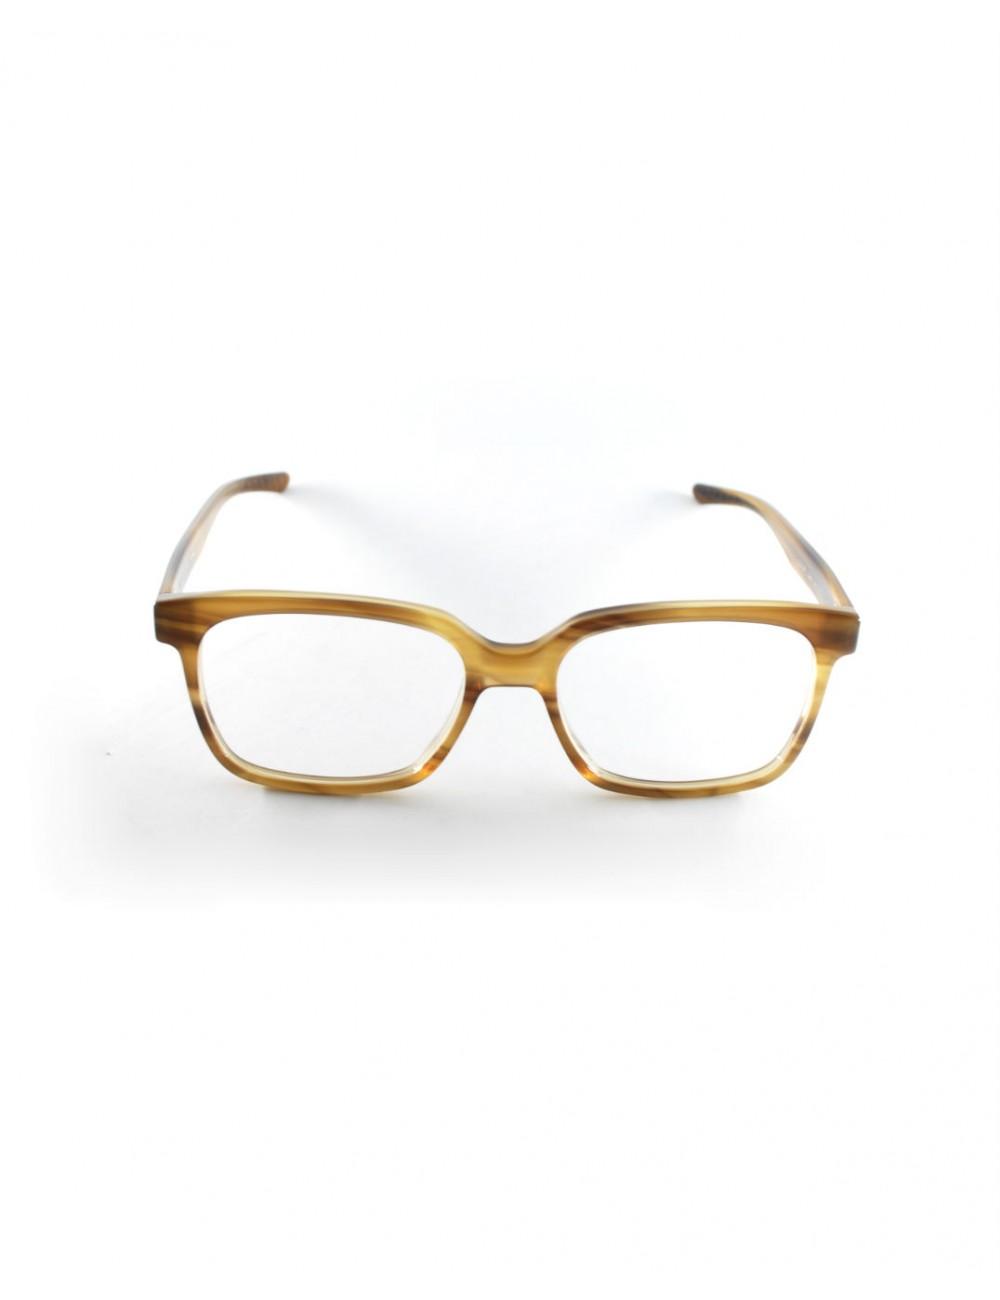 REIZ Reiz kiefer 165 eco  EyewearShop Online